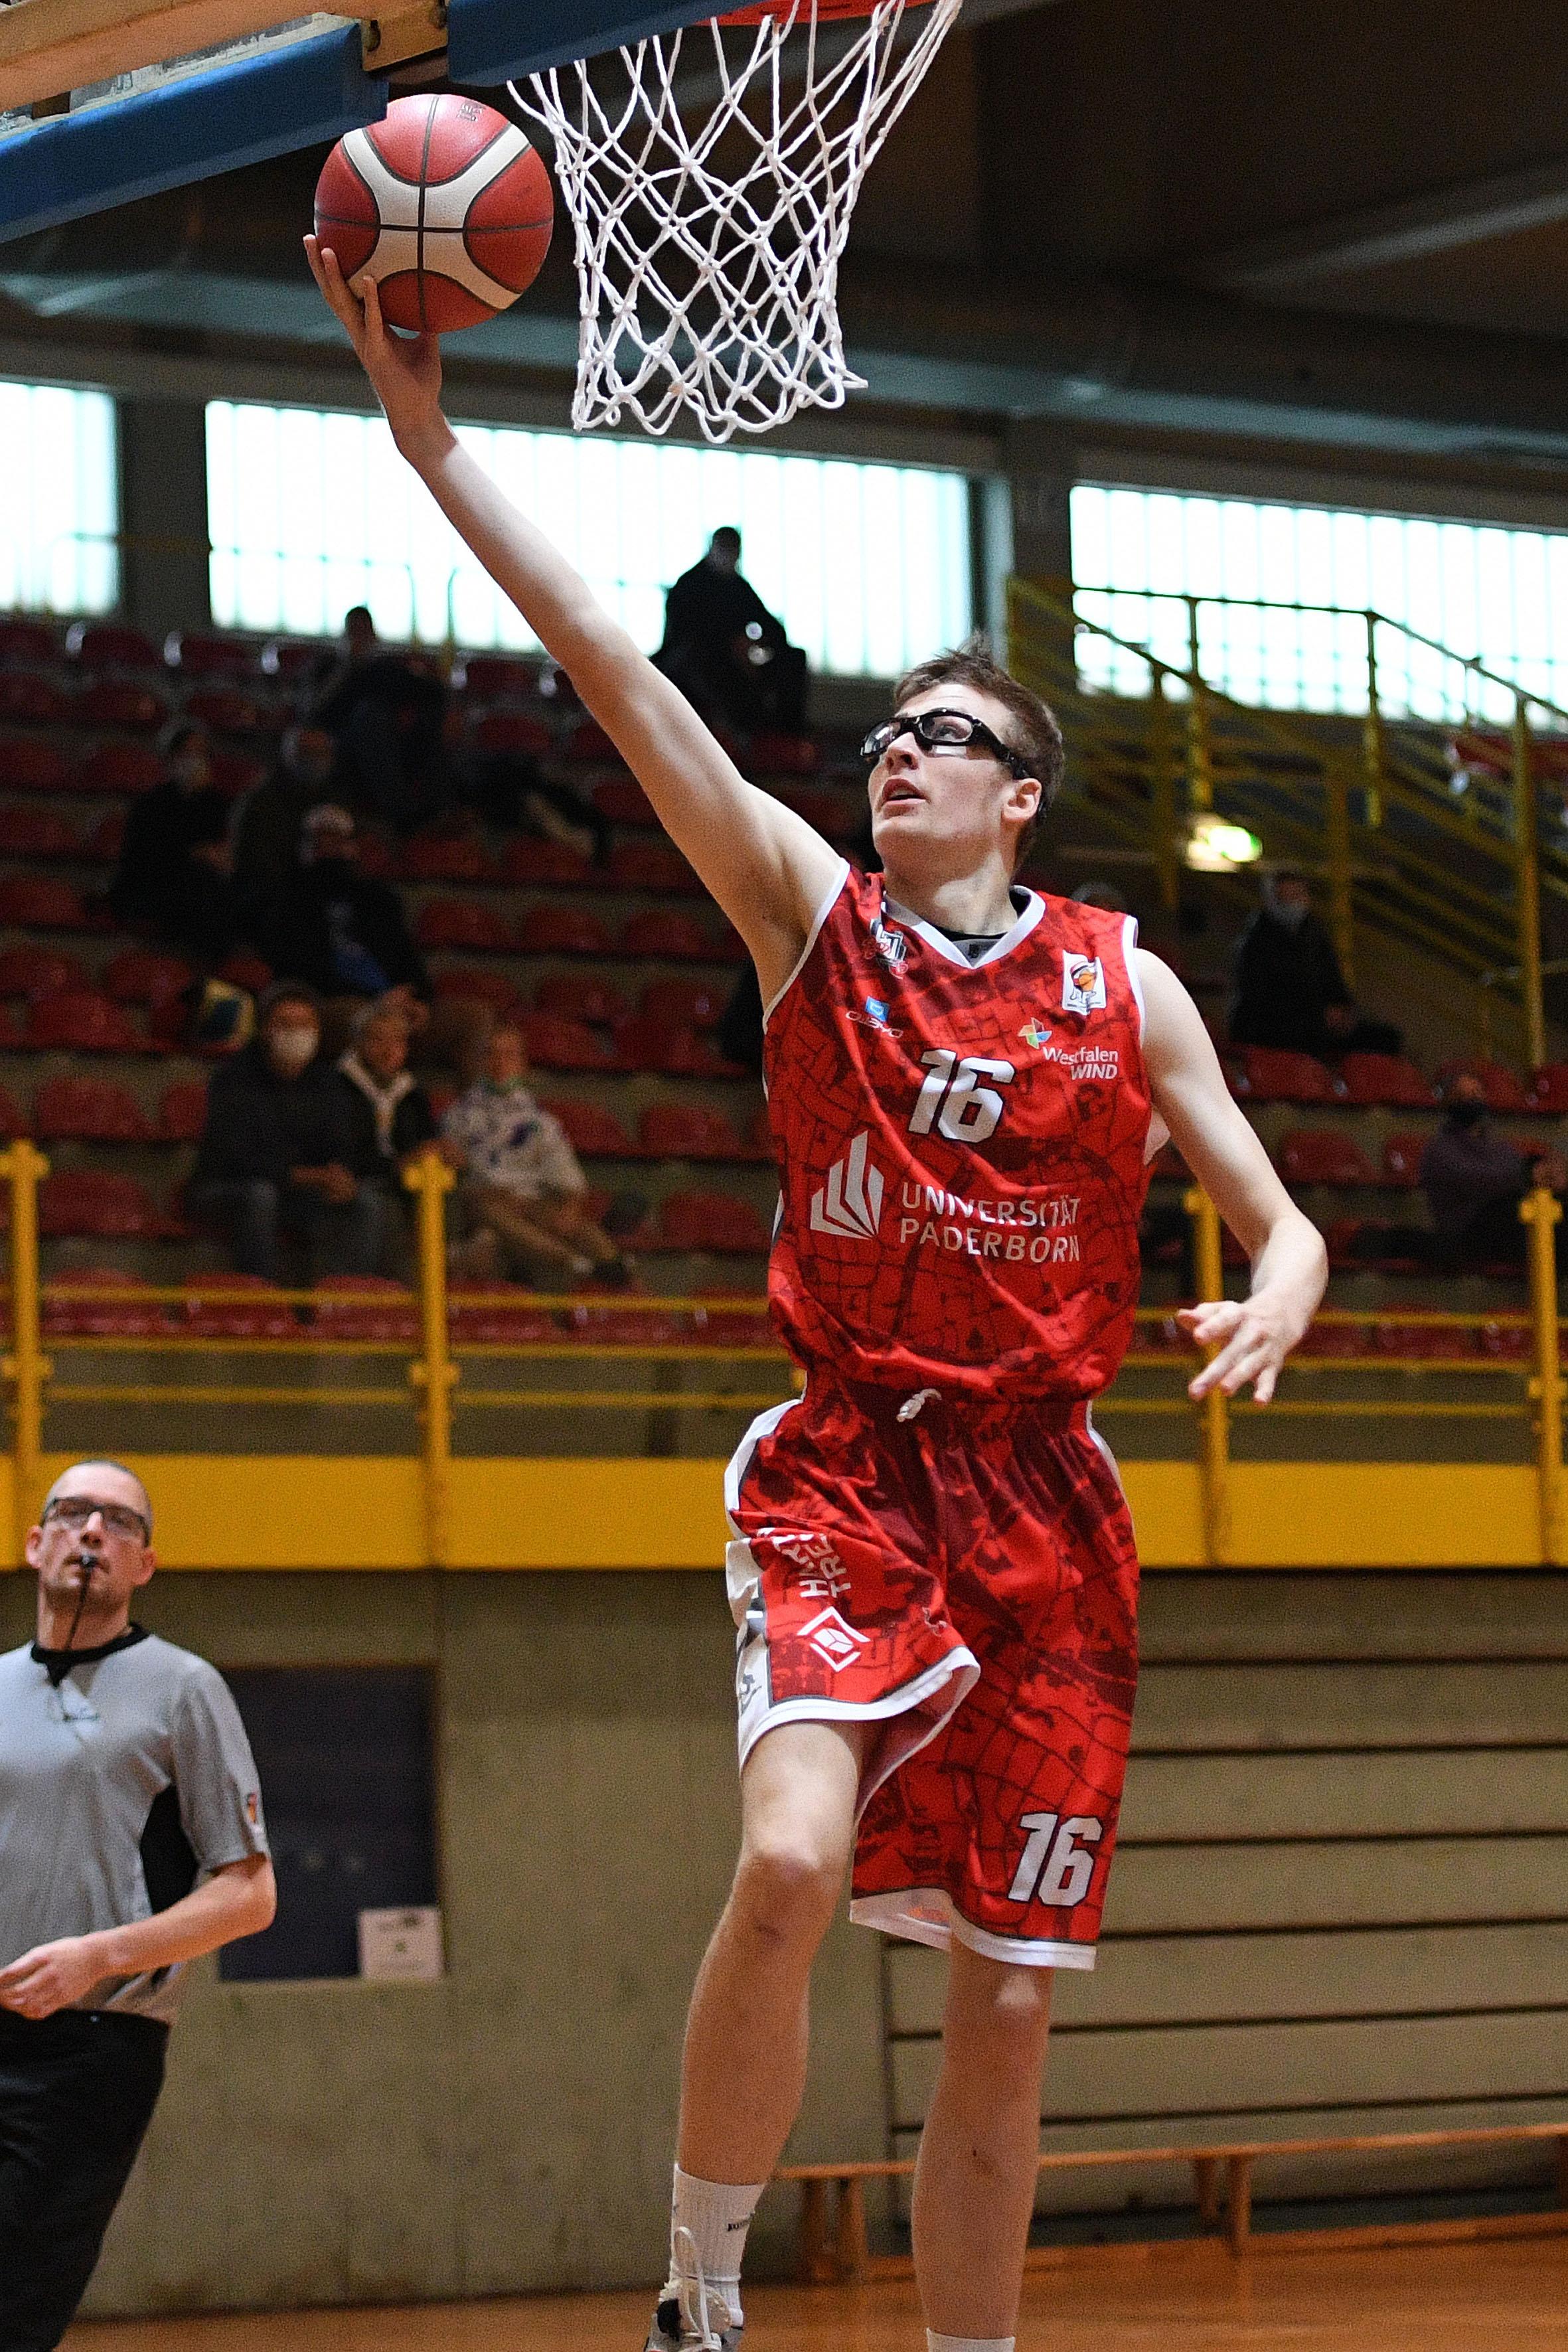 2020-10-18-JBBL-Uni-Baskets-Paderborn-UBC-Muenster_8137